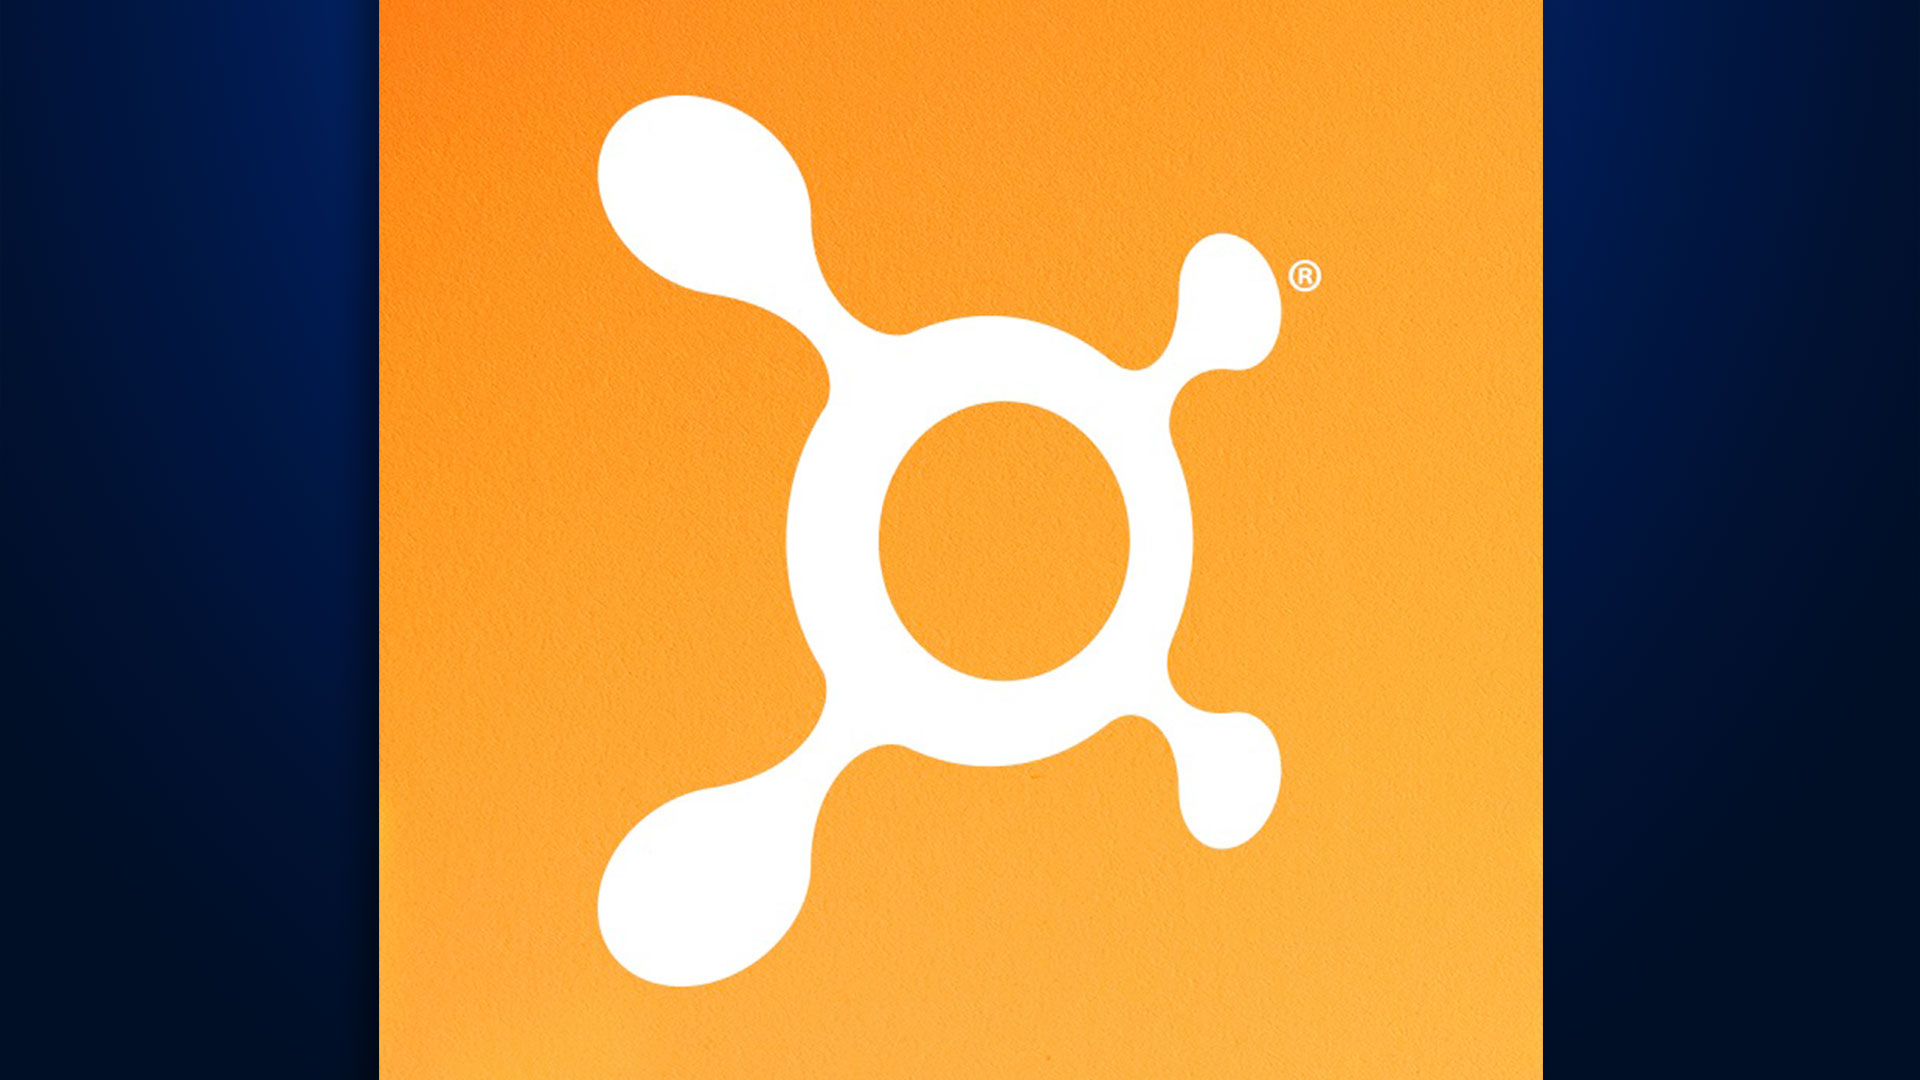 KELO Orangetheory Fitness